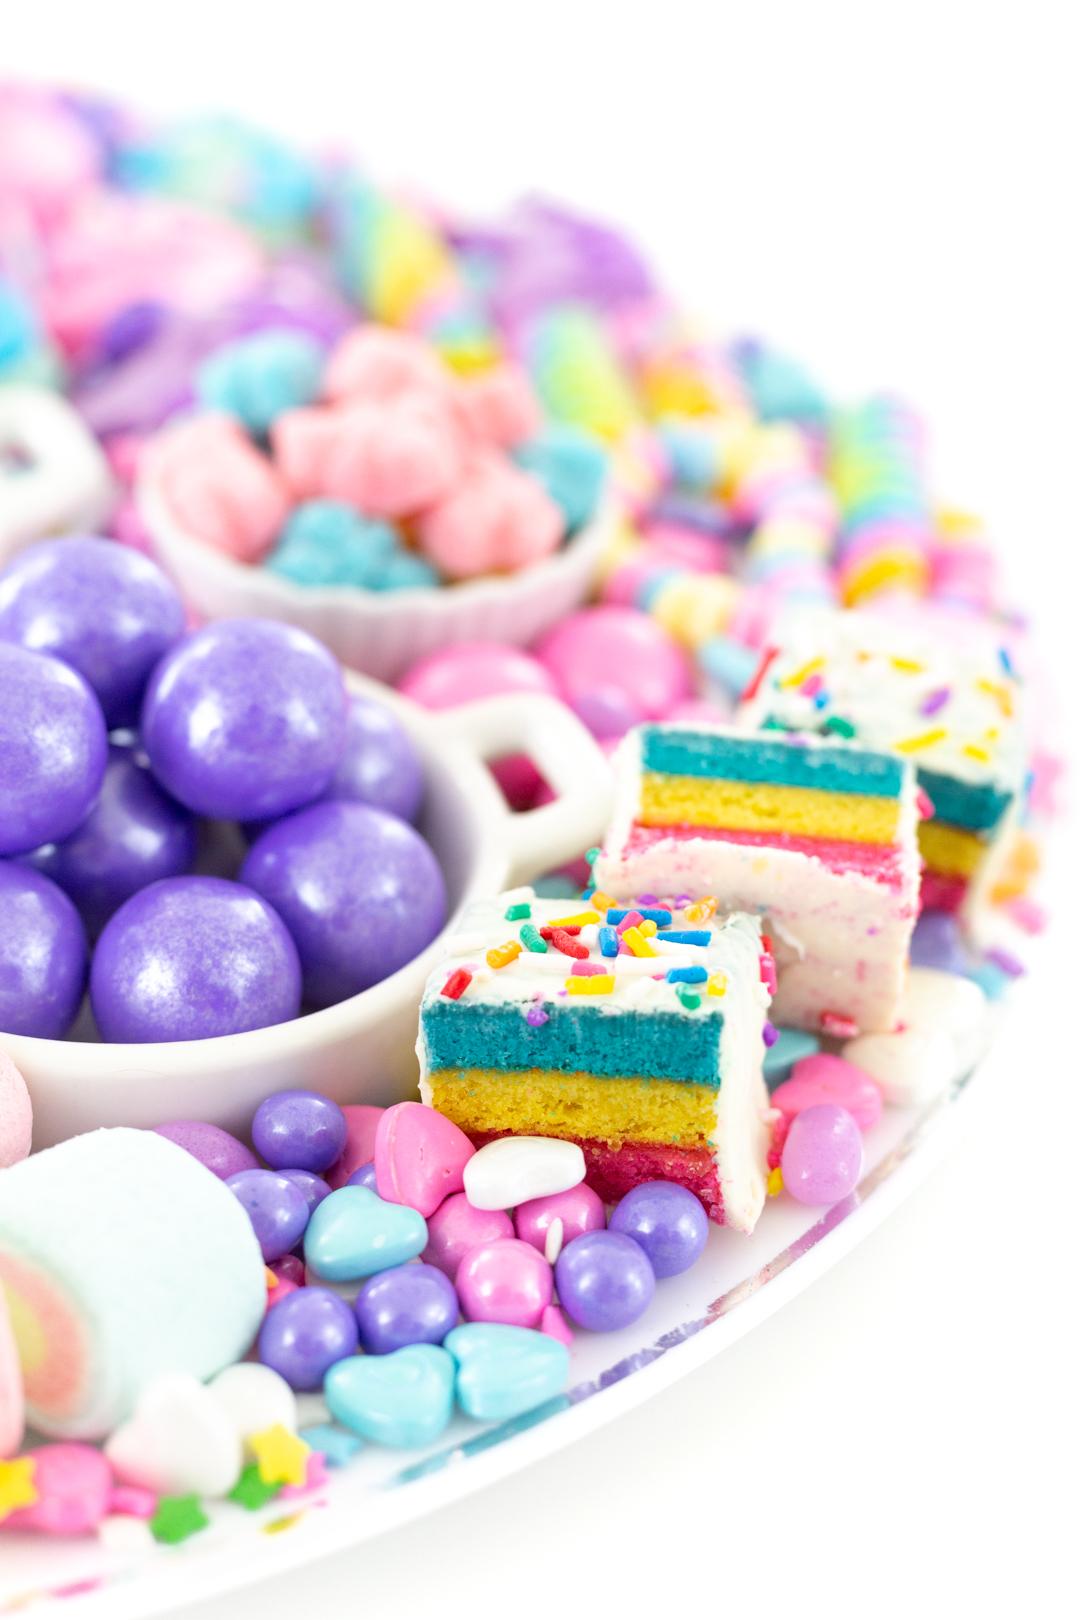 purple gumballs, pastel cake bites and patel candies